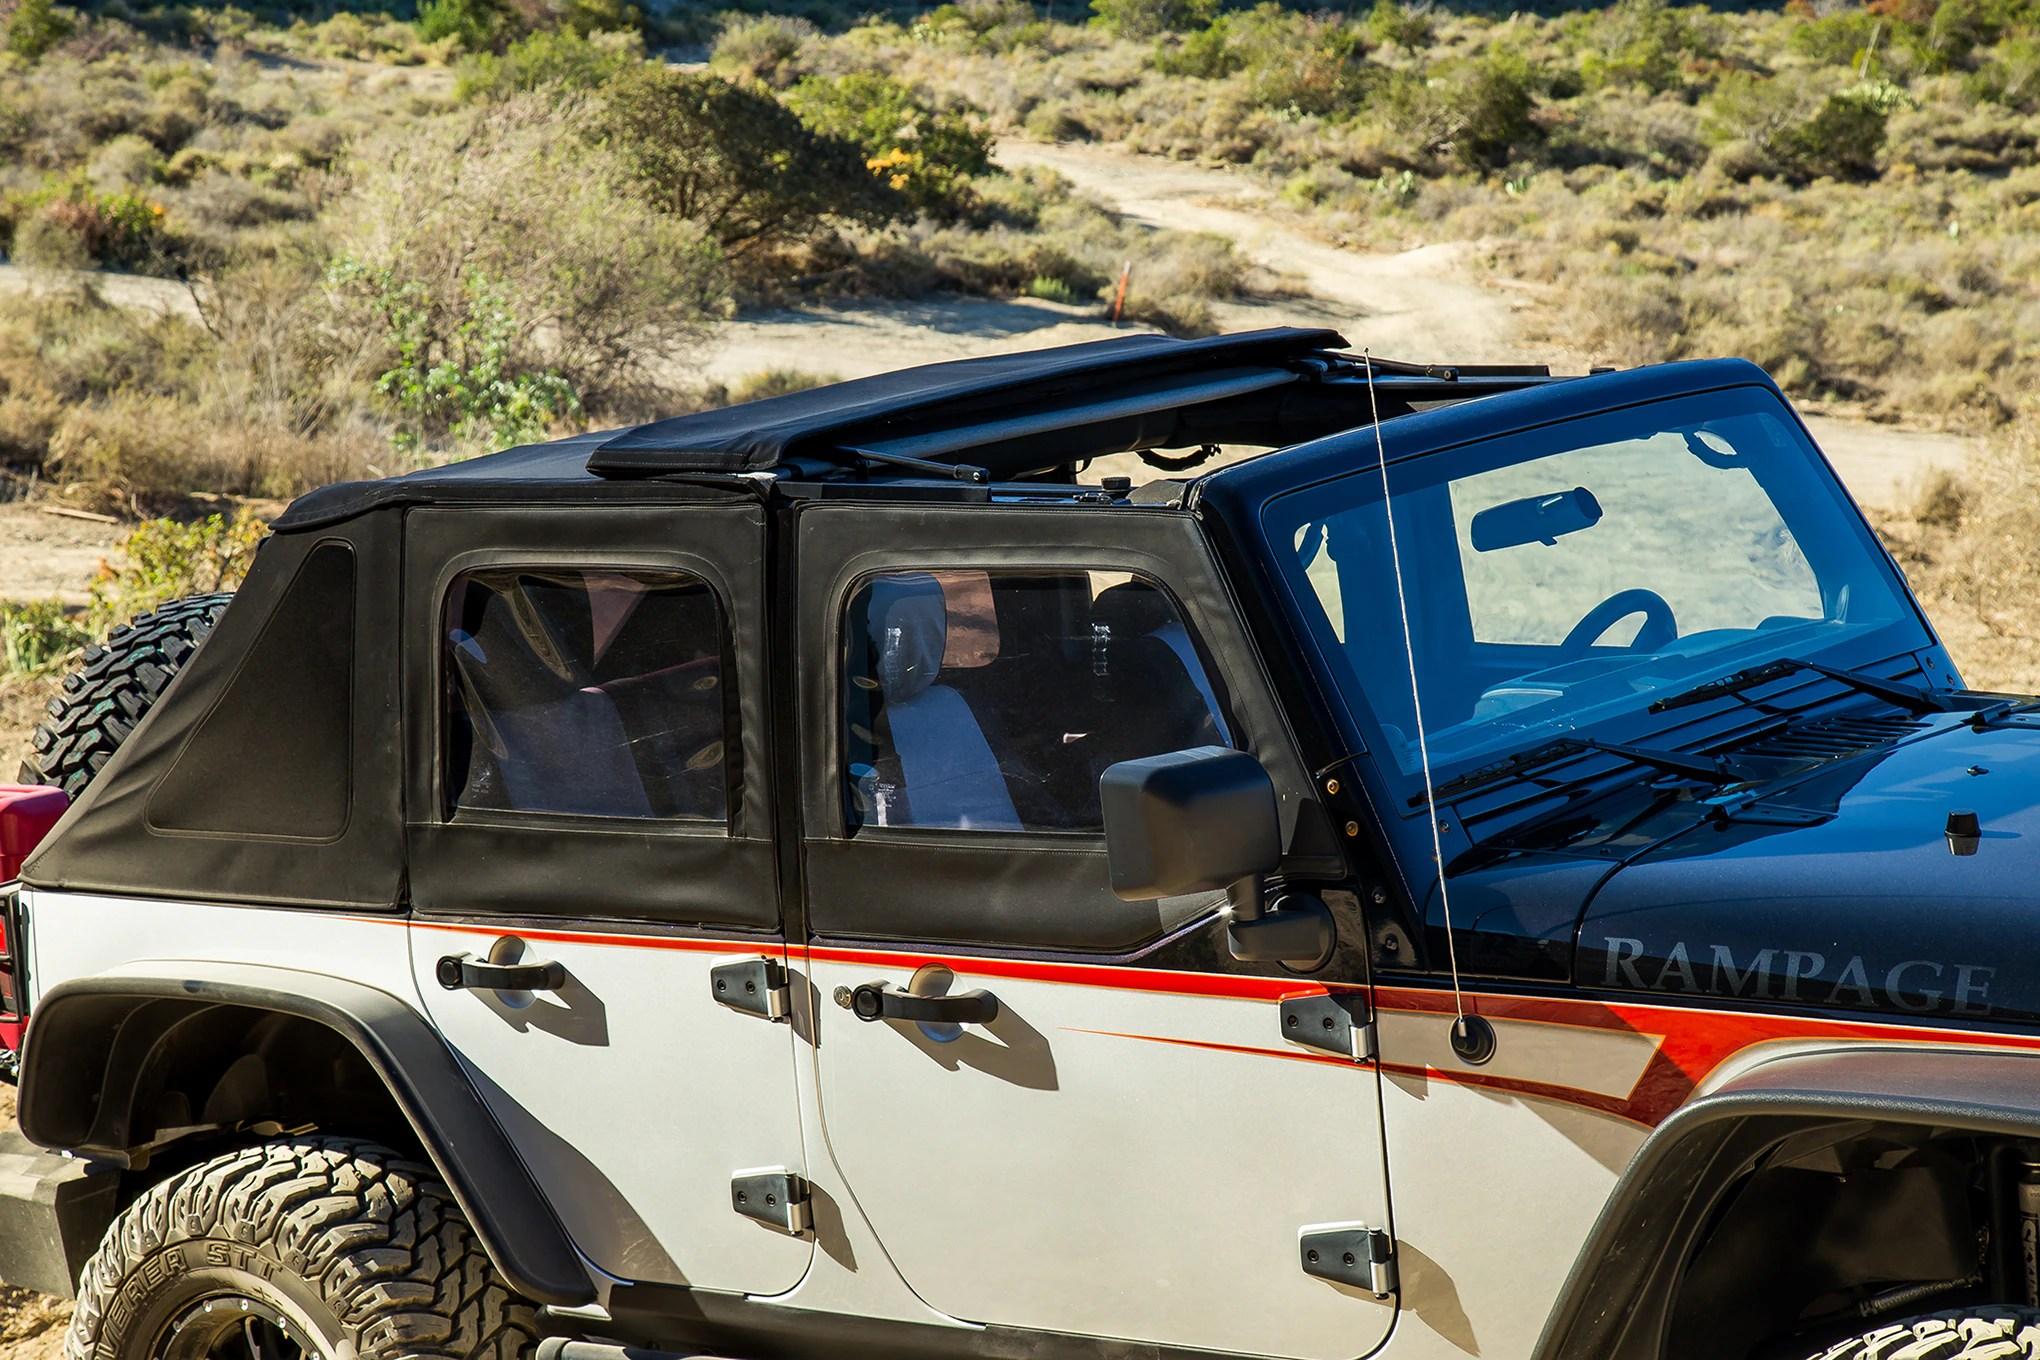 medium resolution of  005 rampage frameless plus trail top 006 dynatrac progrip ii jeep jk brake upgrade kit 007 painless performance jeep cj wiring